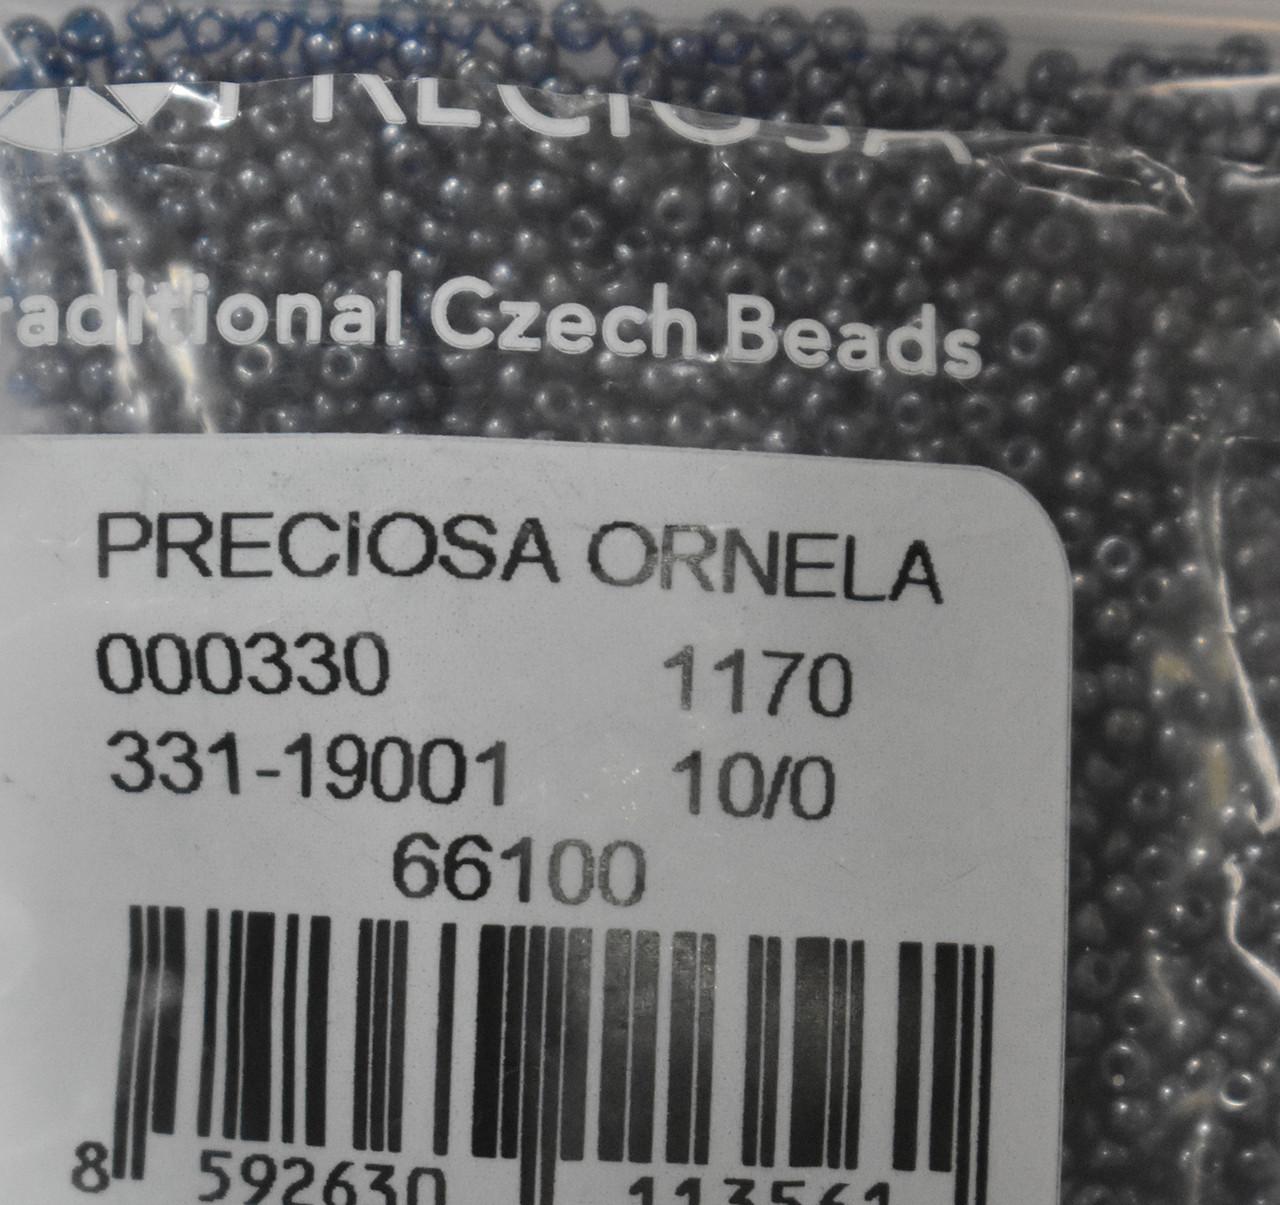 Бисер Preciosa 10/0 цвет 66100 темно-синий 10г